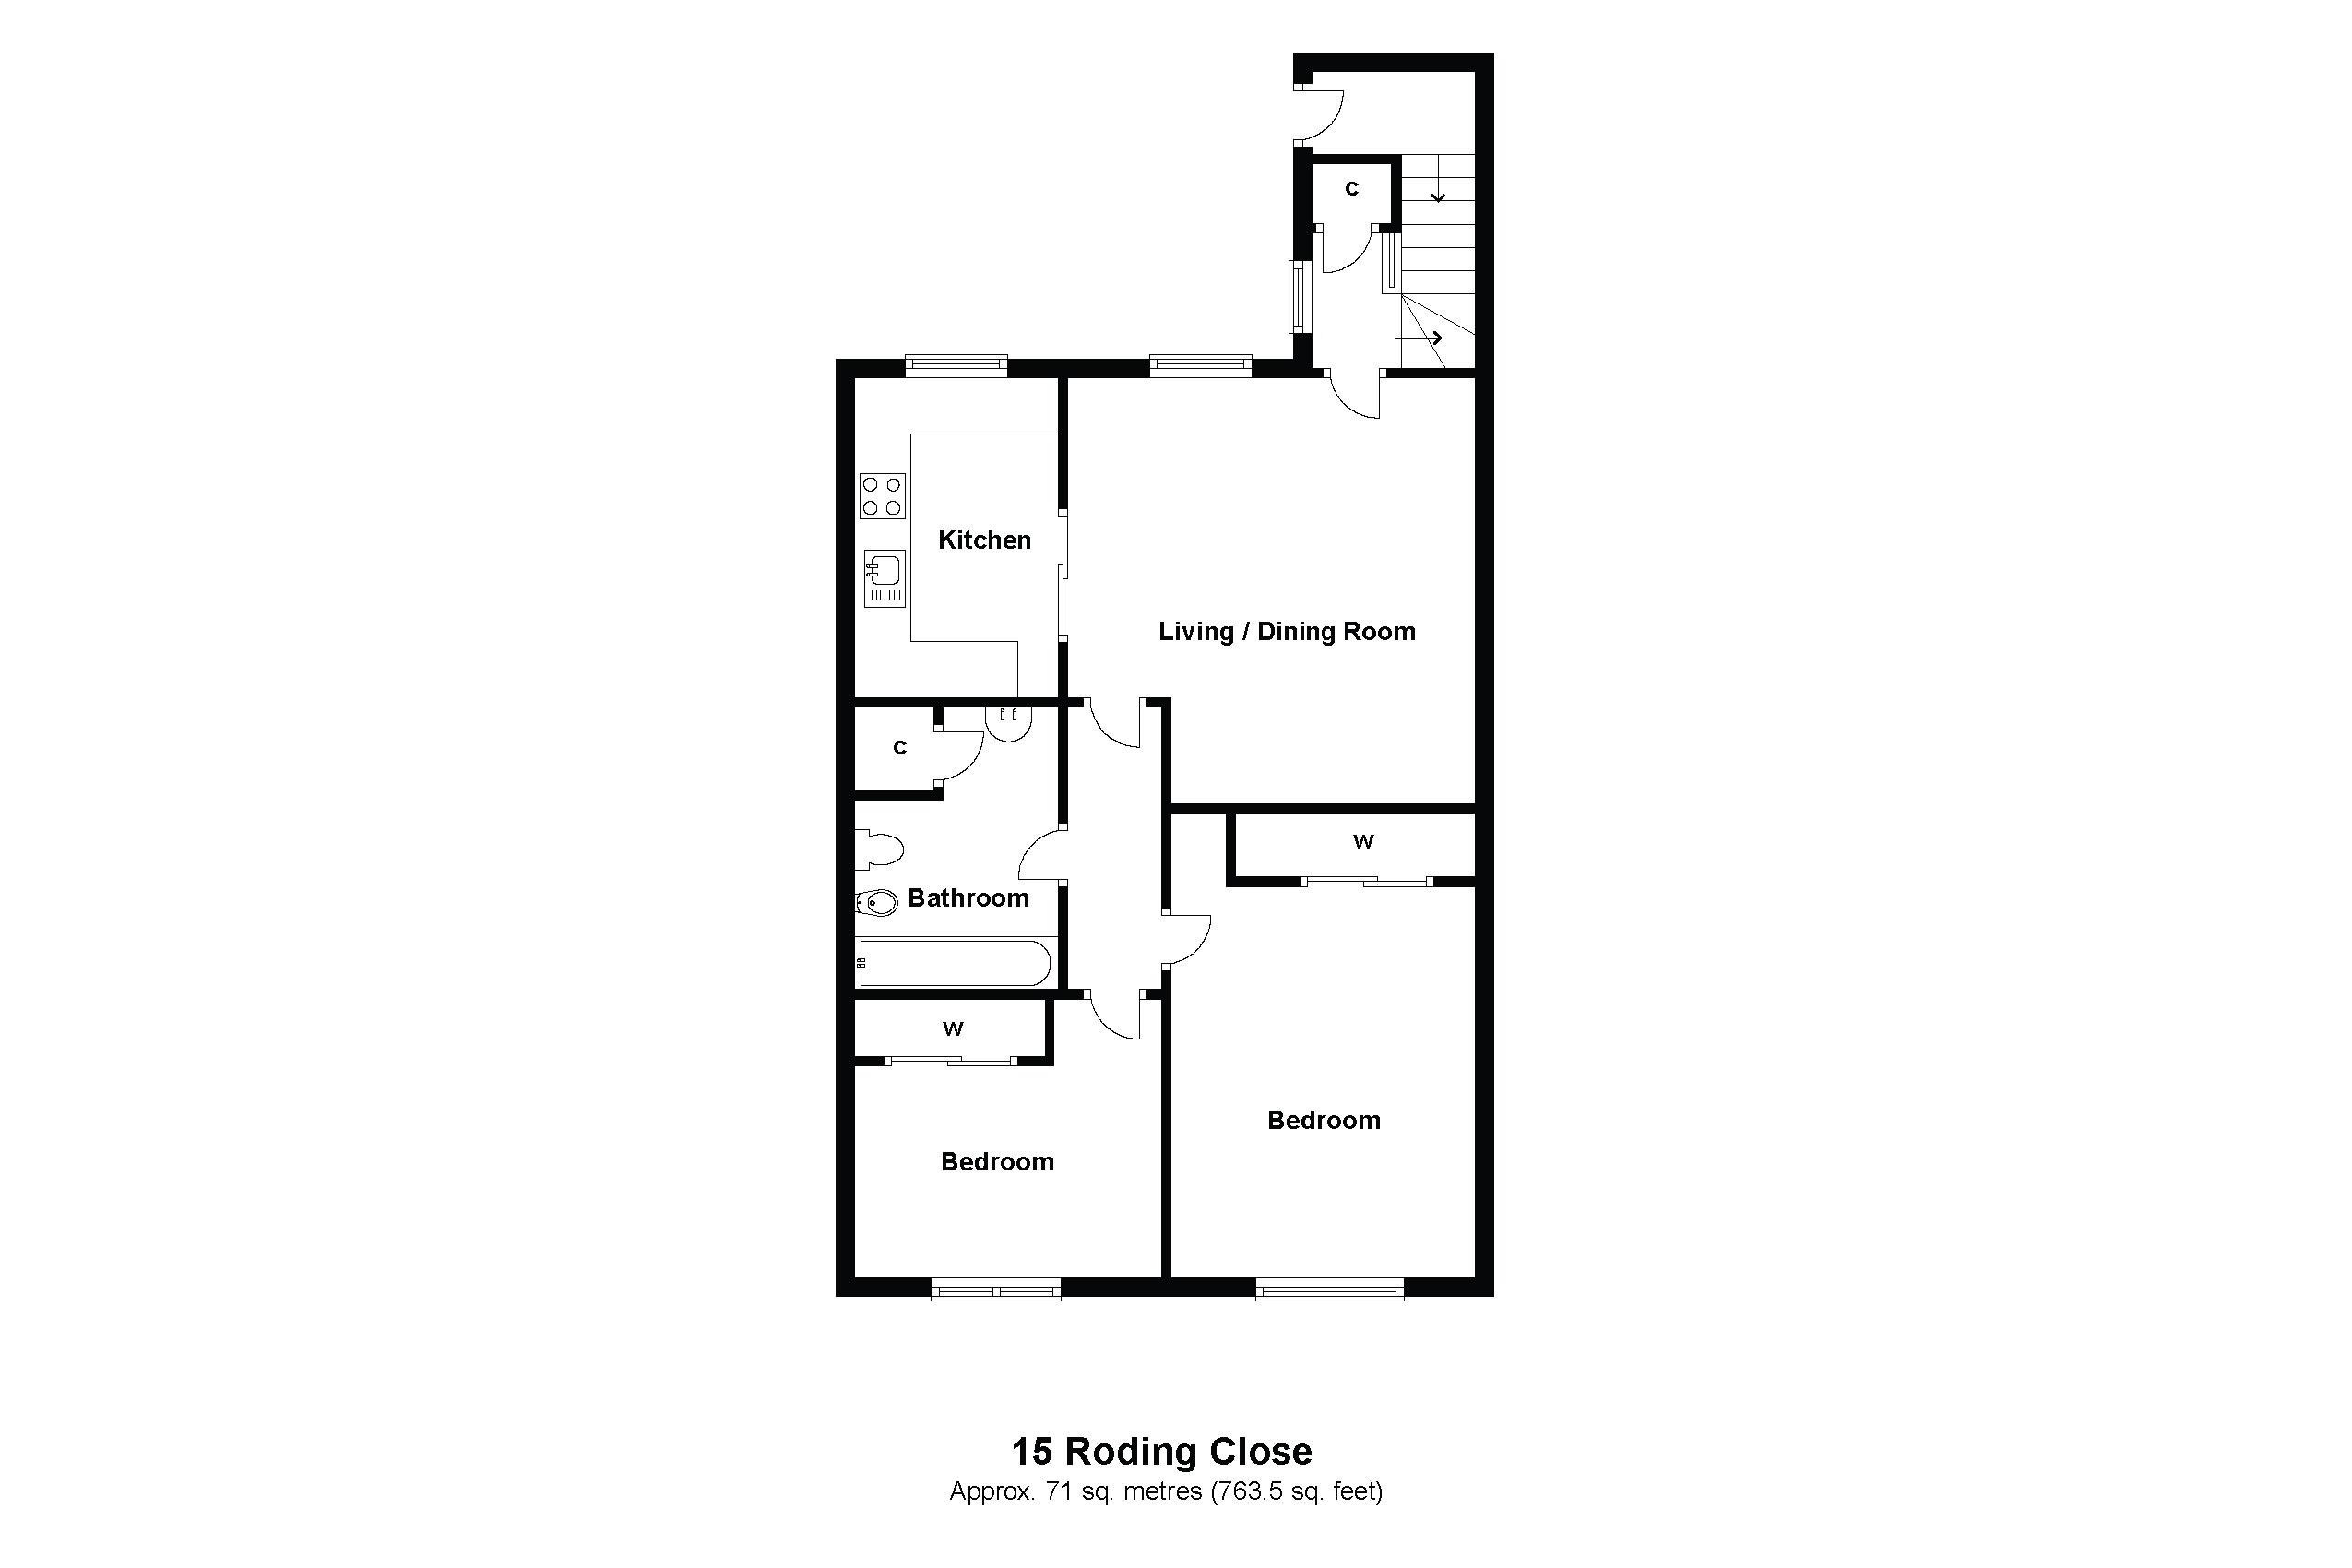 15 Roding Close Floorplan